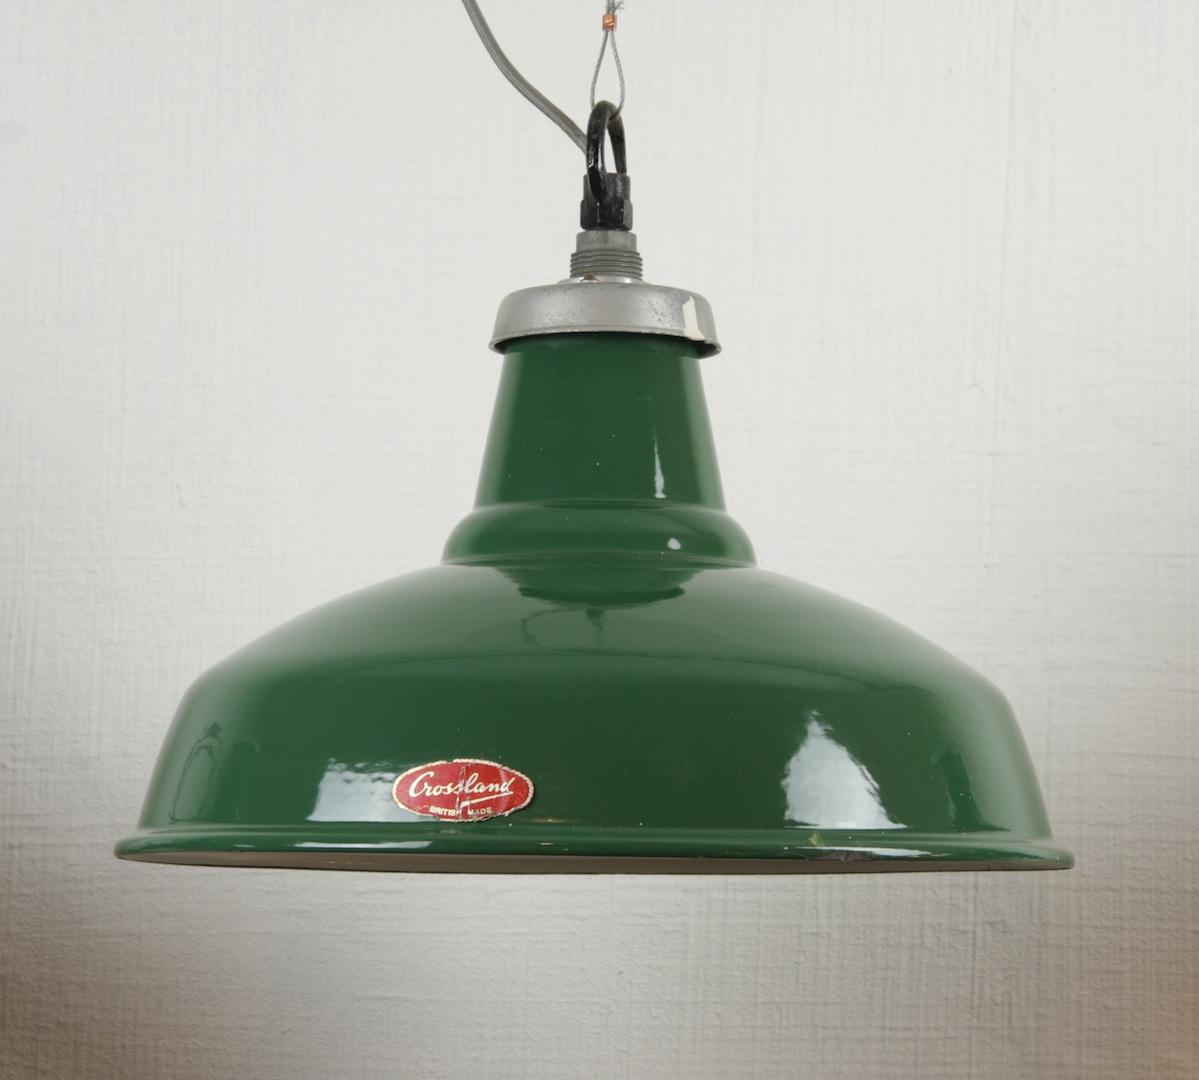 Hoover Industrial Pendant Light: Crossland Enamel Industrial Lights, Suspensions Emaillées